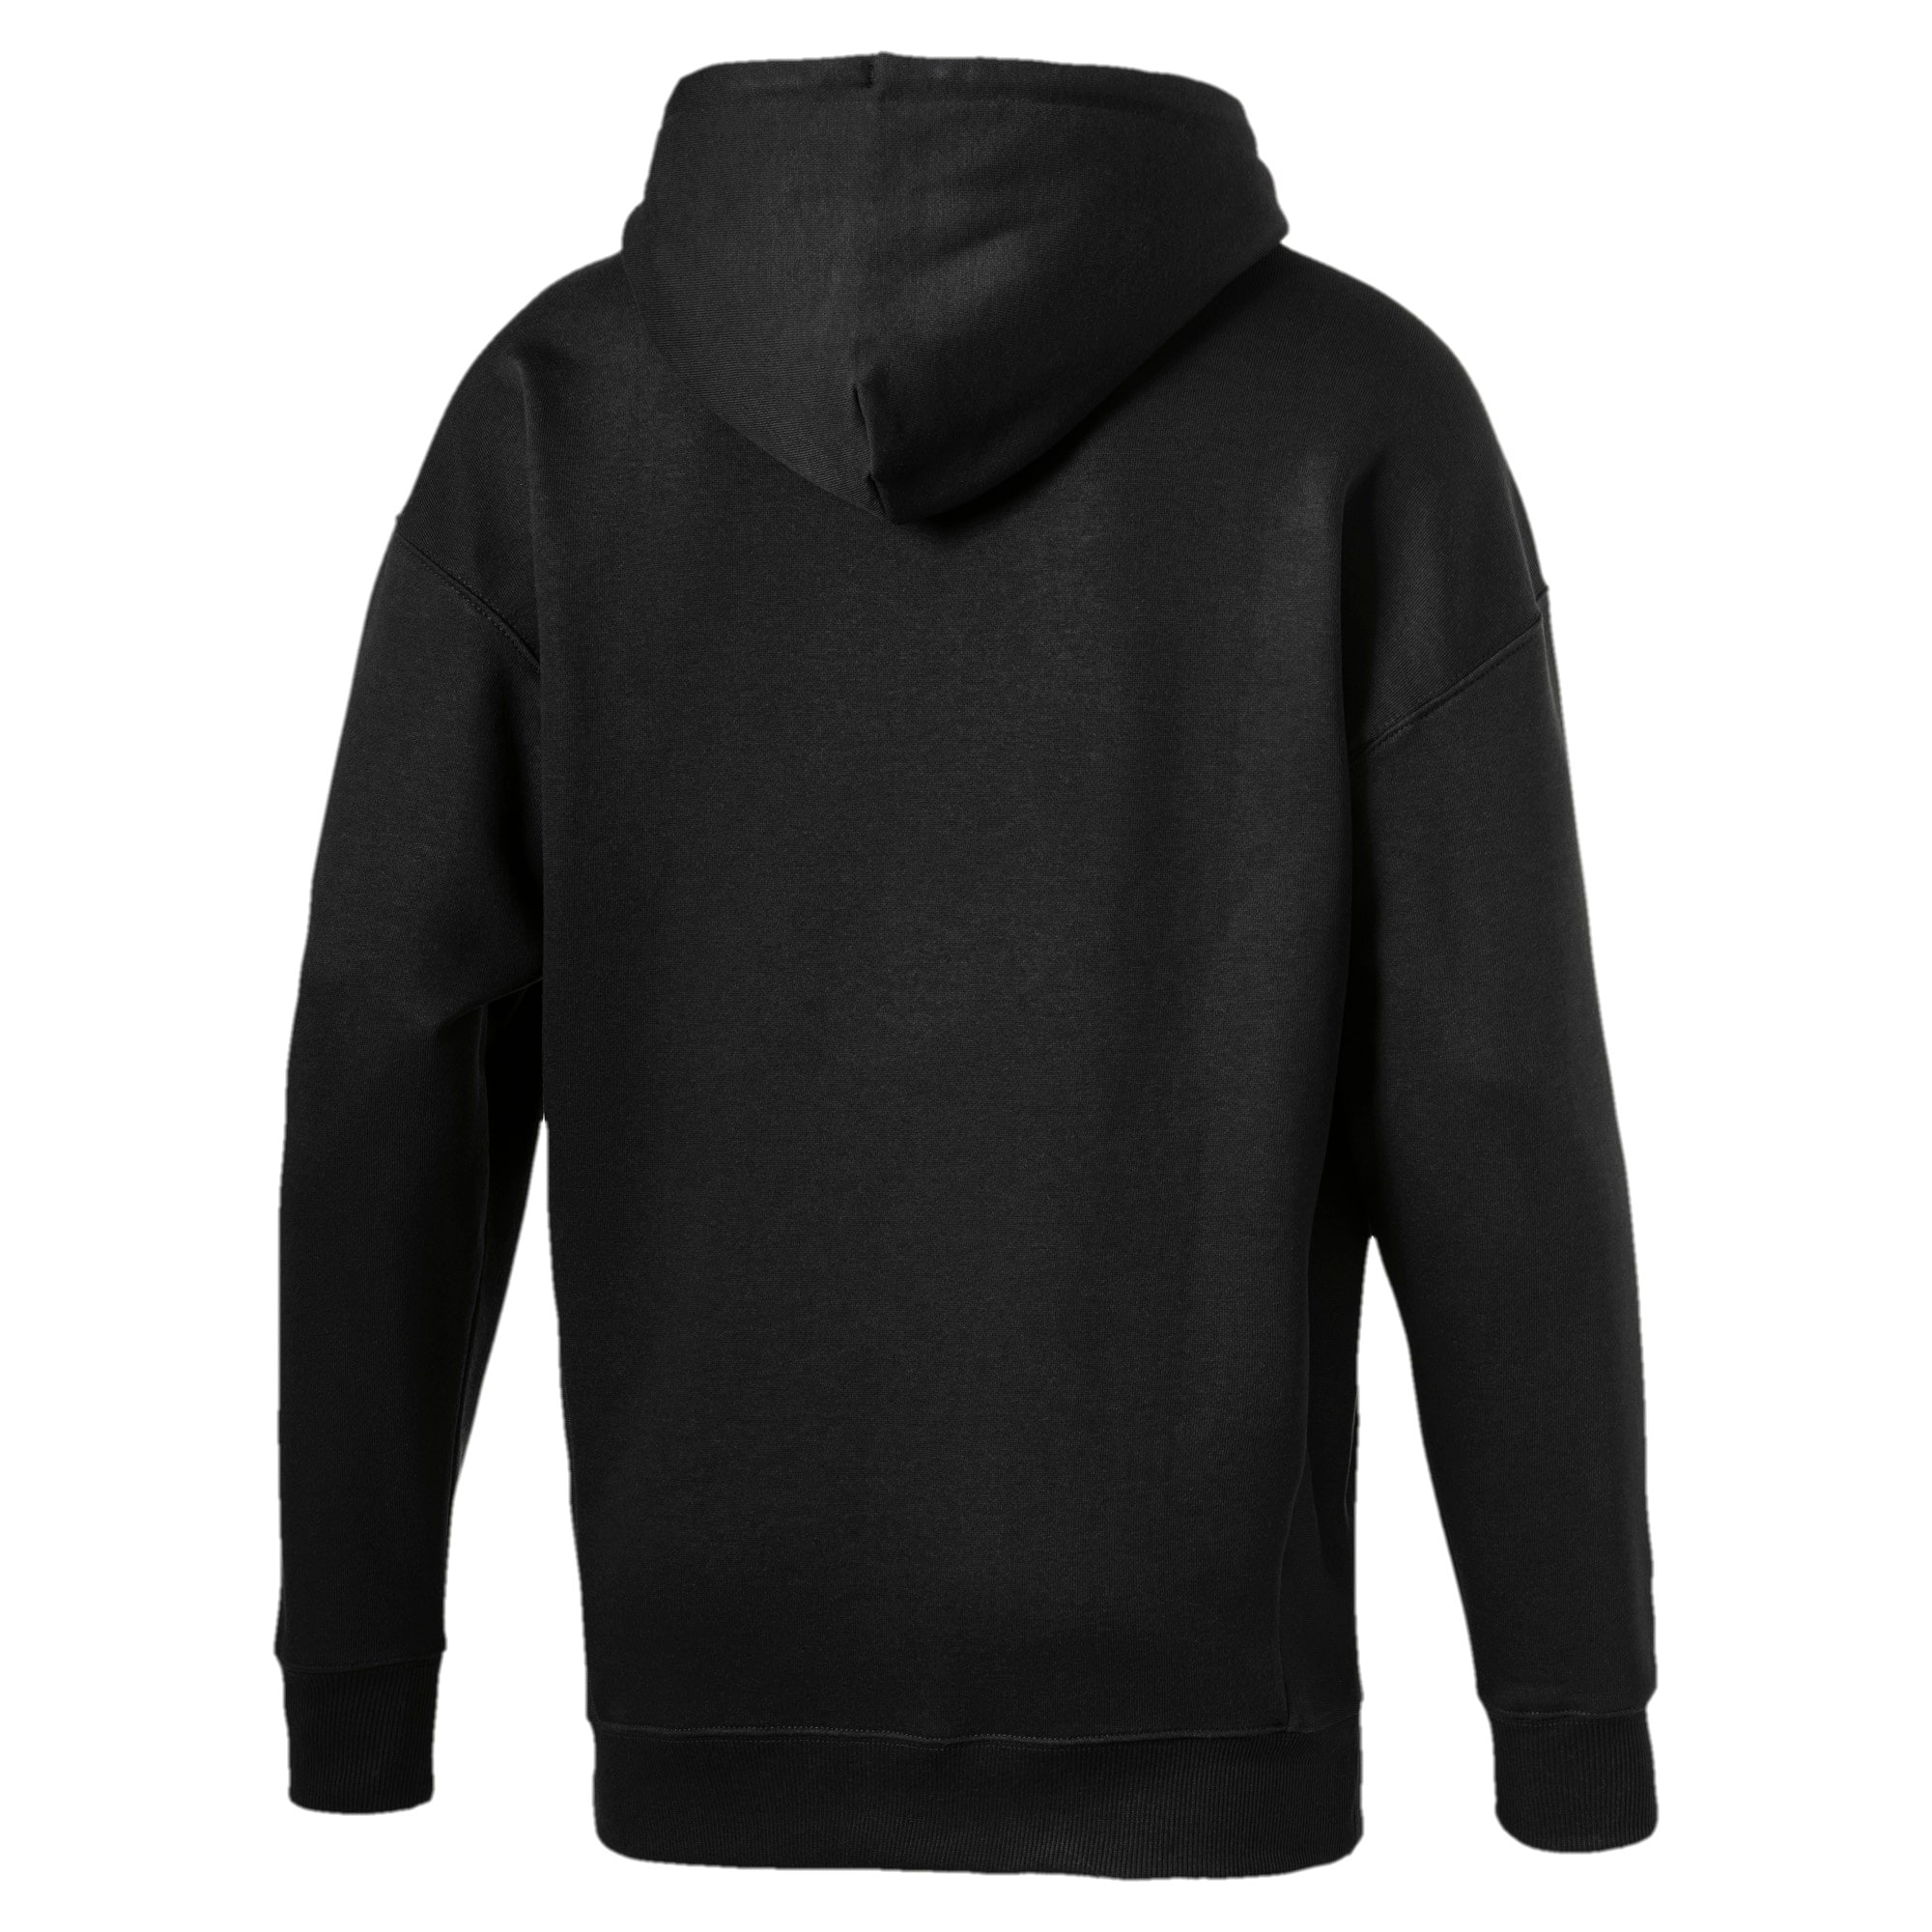 Miniatura 3 de Chaqueta con capucha para hombre OG, Puma Black, mediano